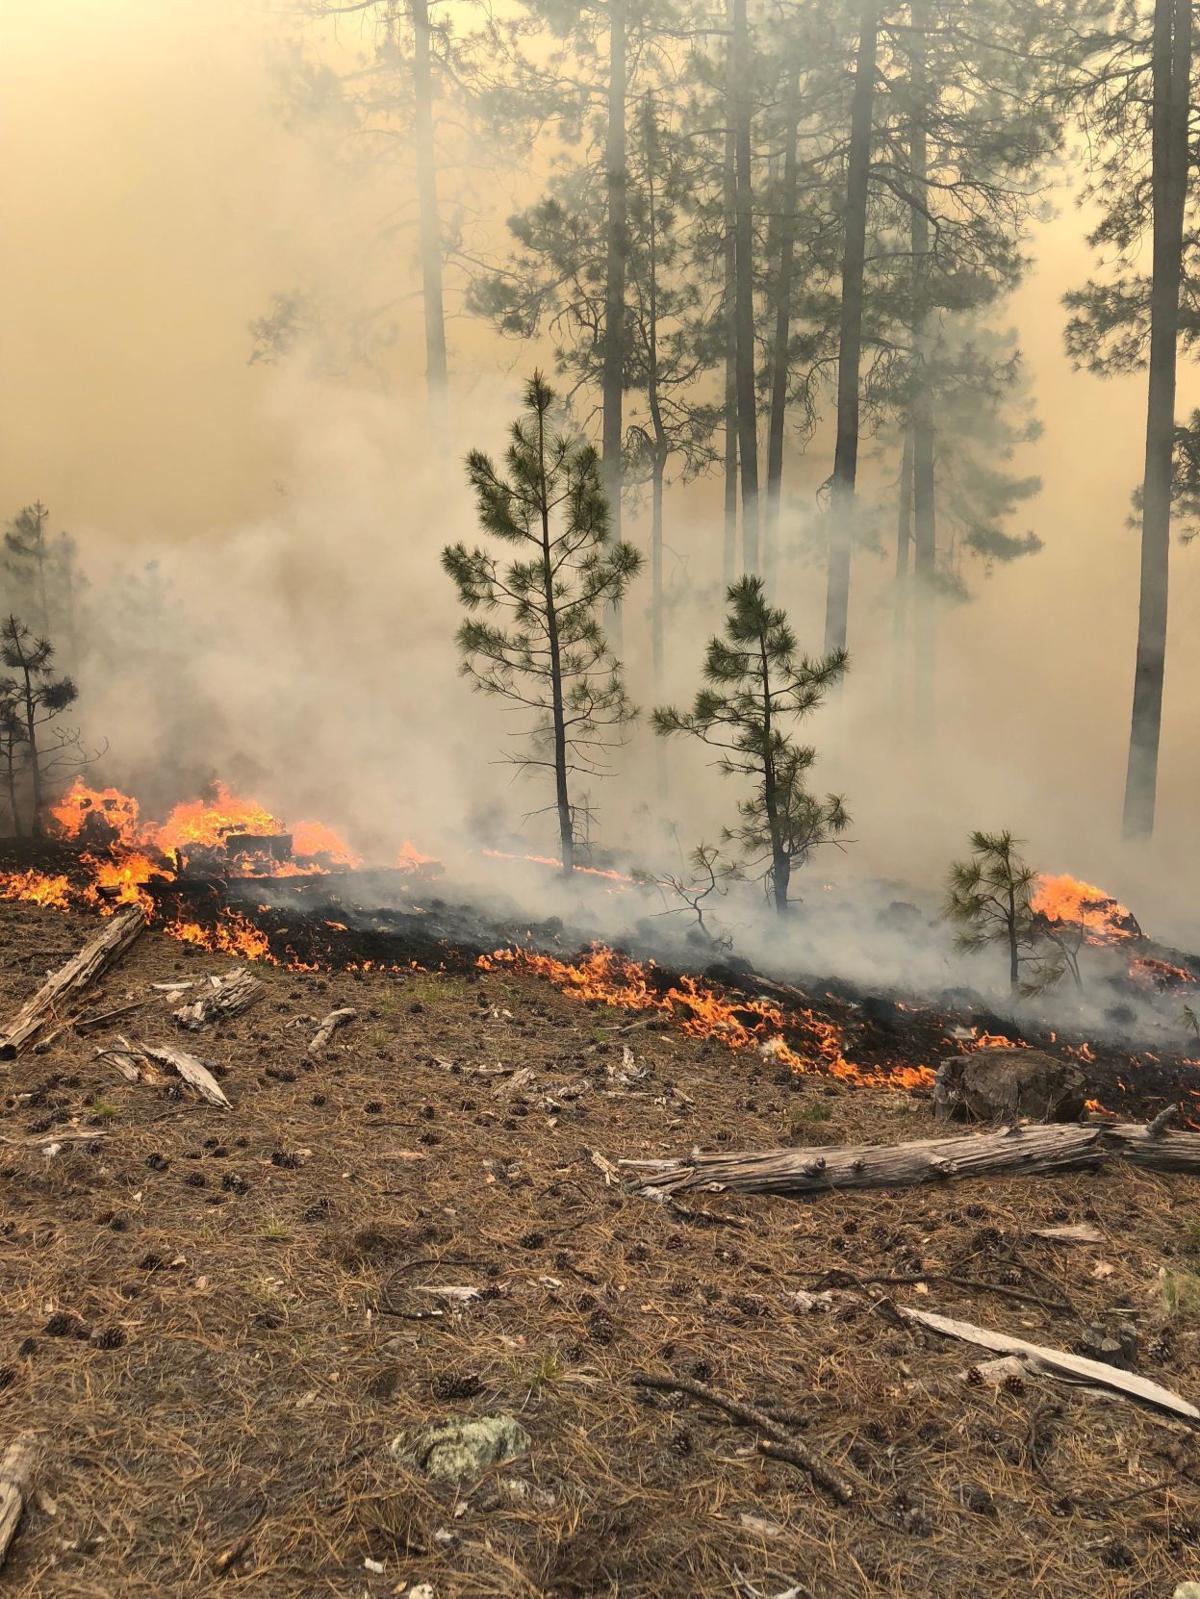 coldwater fire 2.jpg